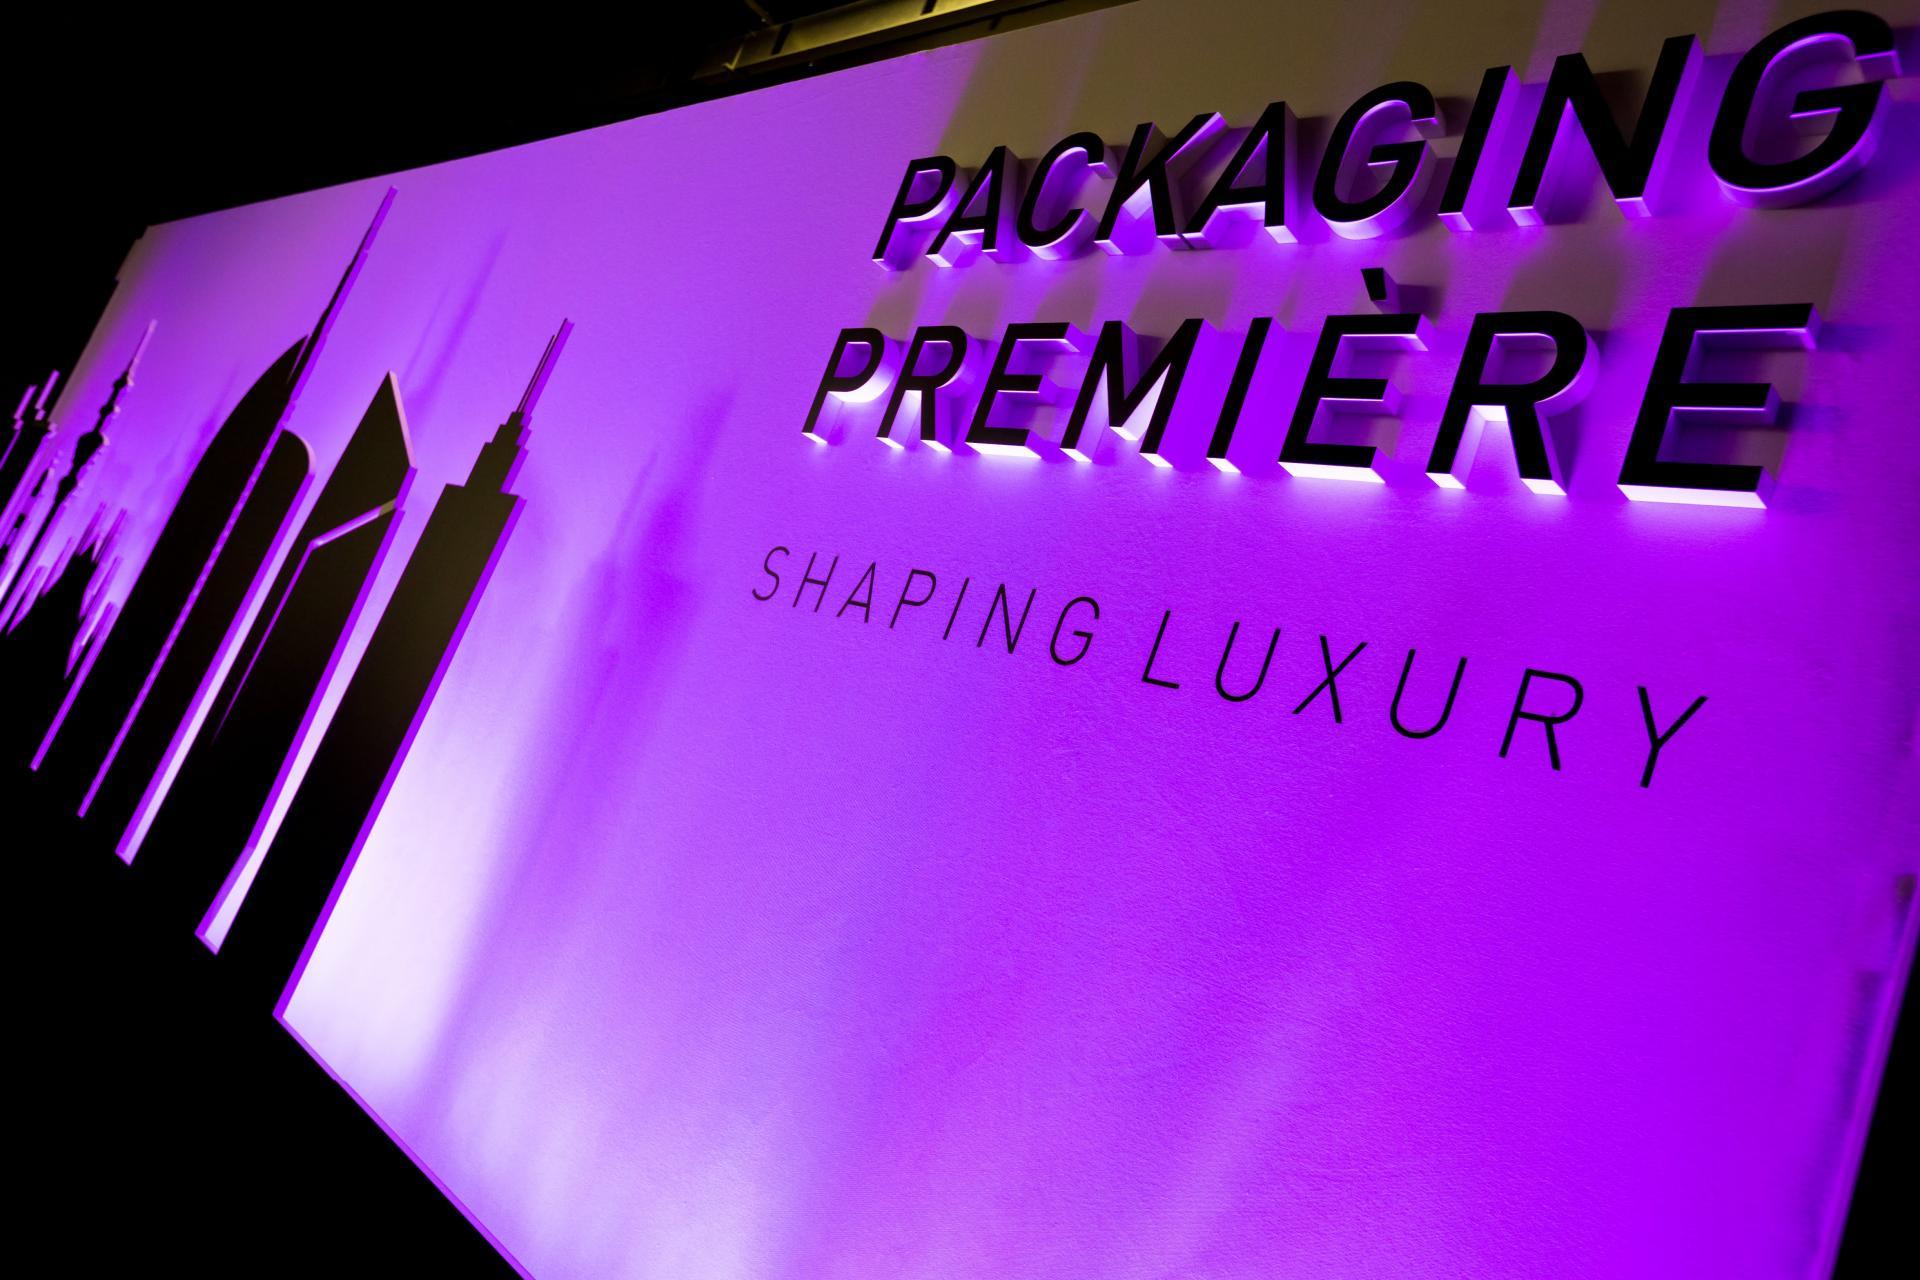 Packaging Première, appuntamento con il packaging di lusso